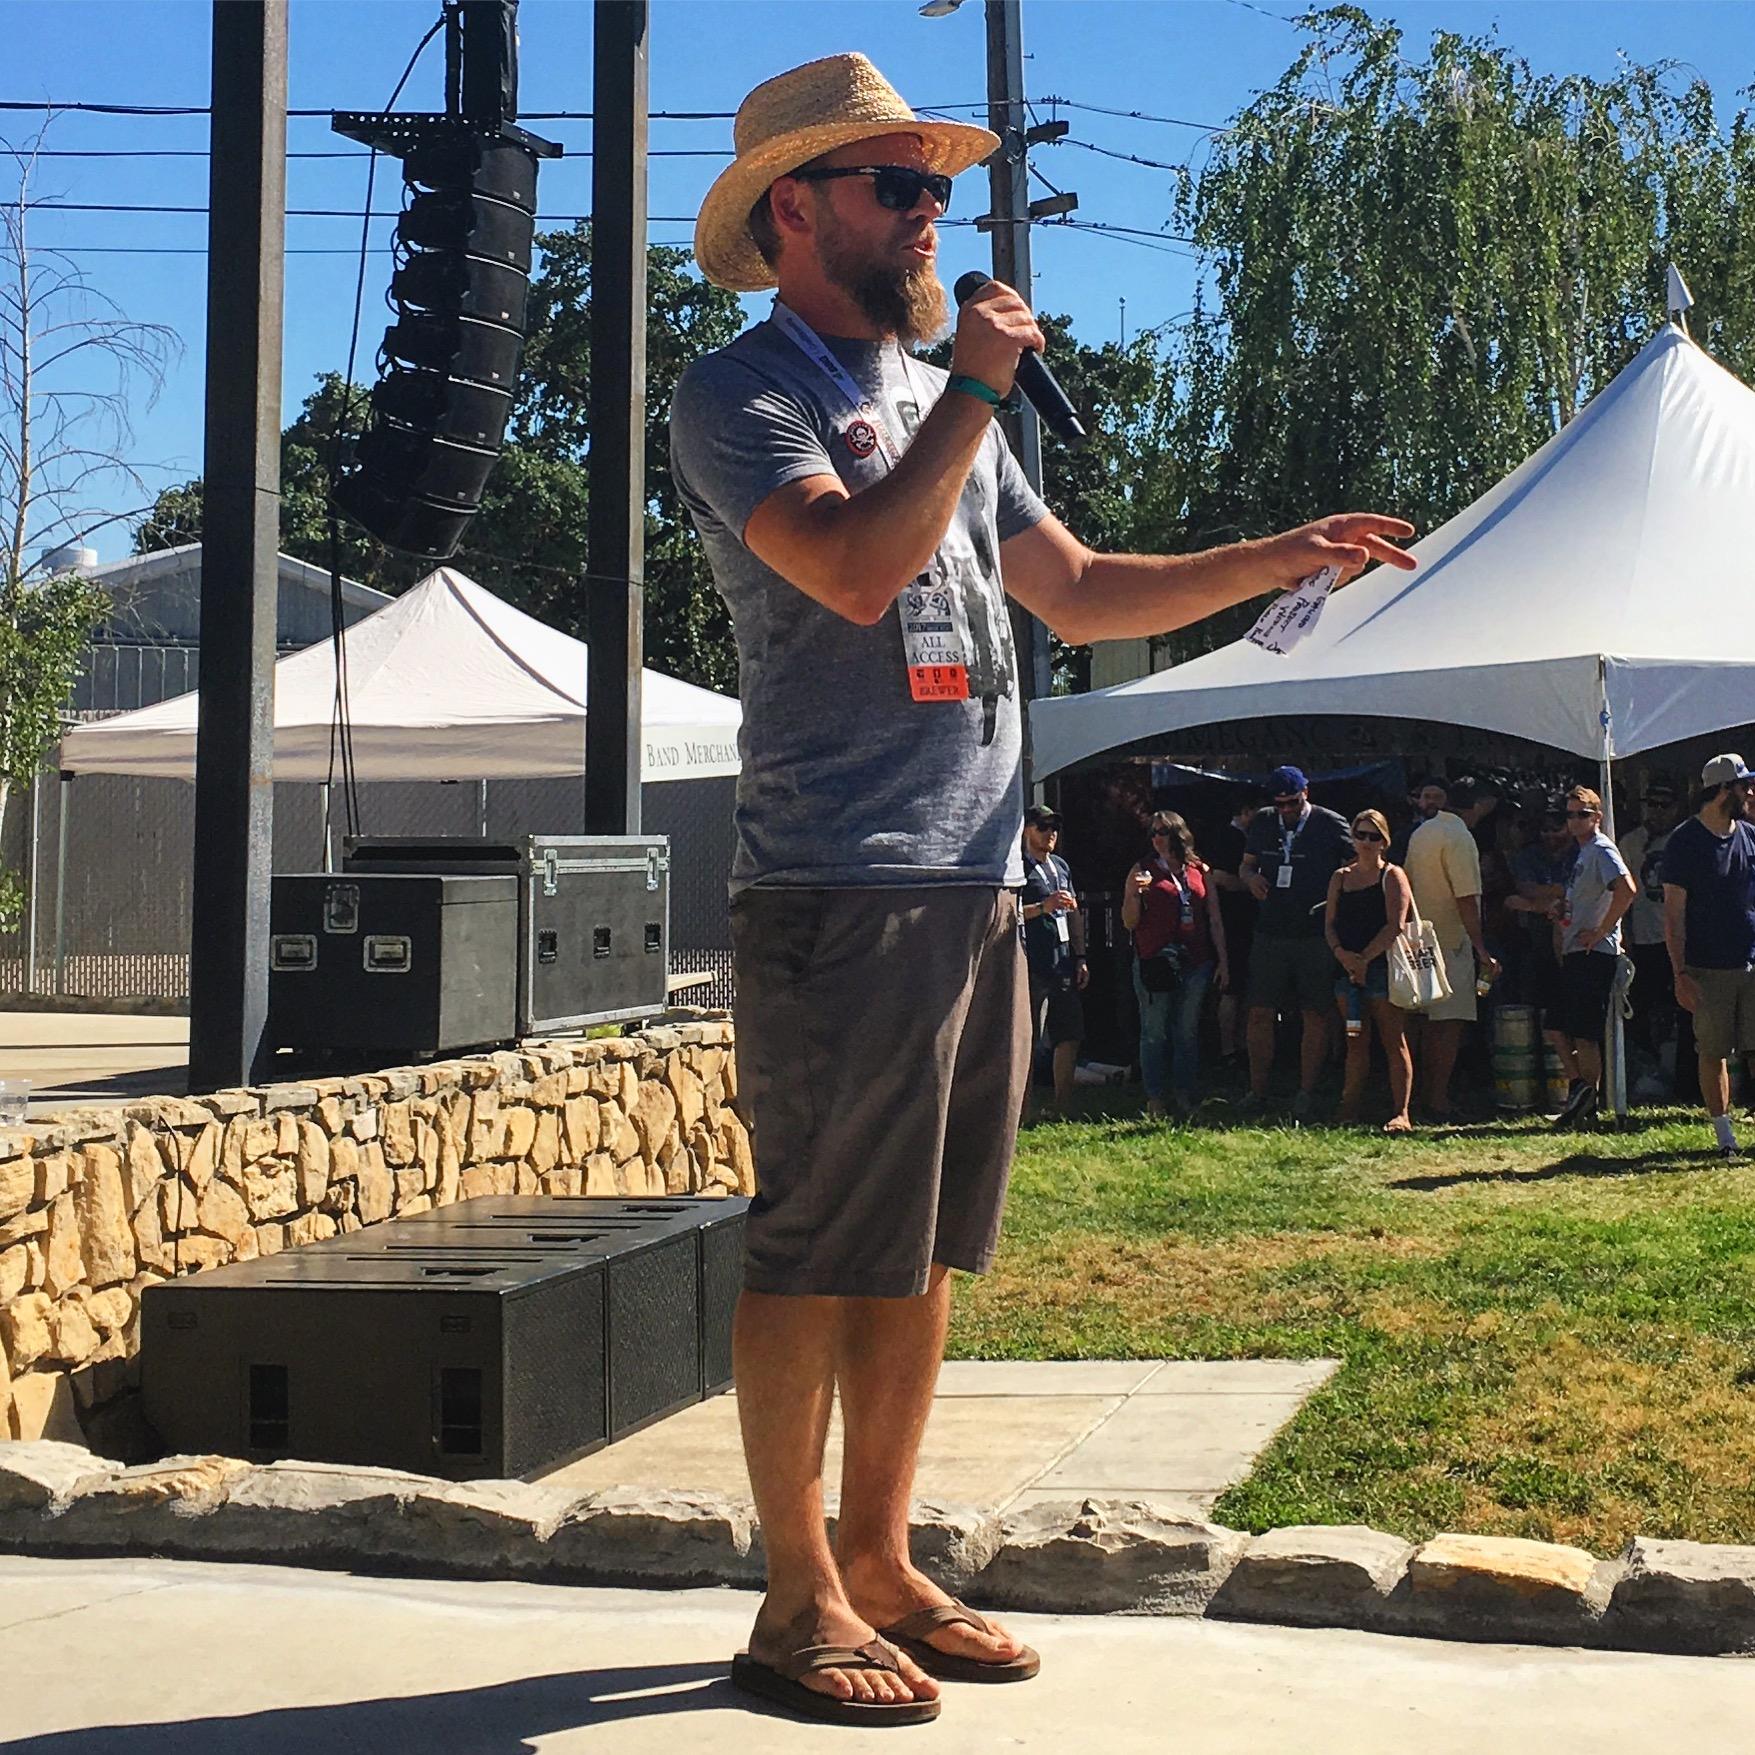 What A Weekend! Attending the 2017 Firestone Walker Invitational Beer Fest.... : BREWPUBLIC.com ...